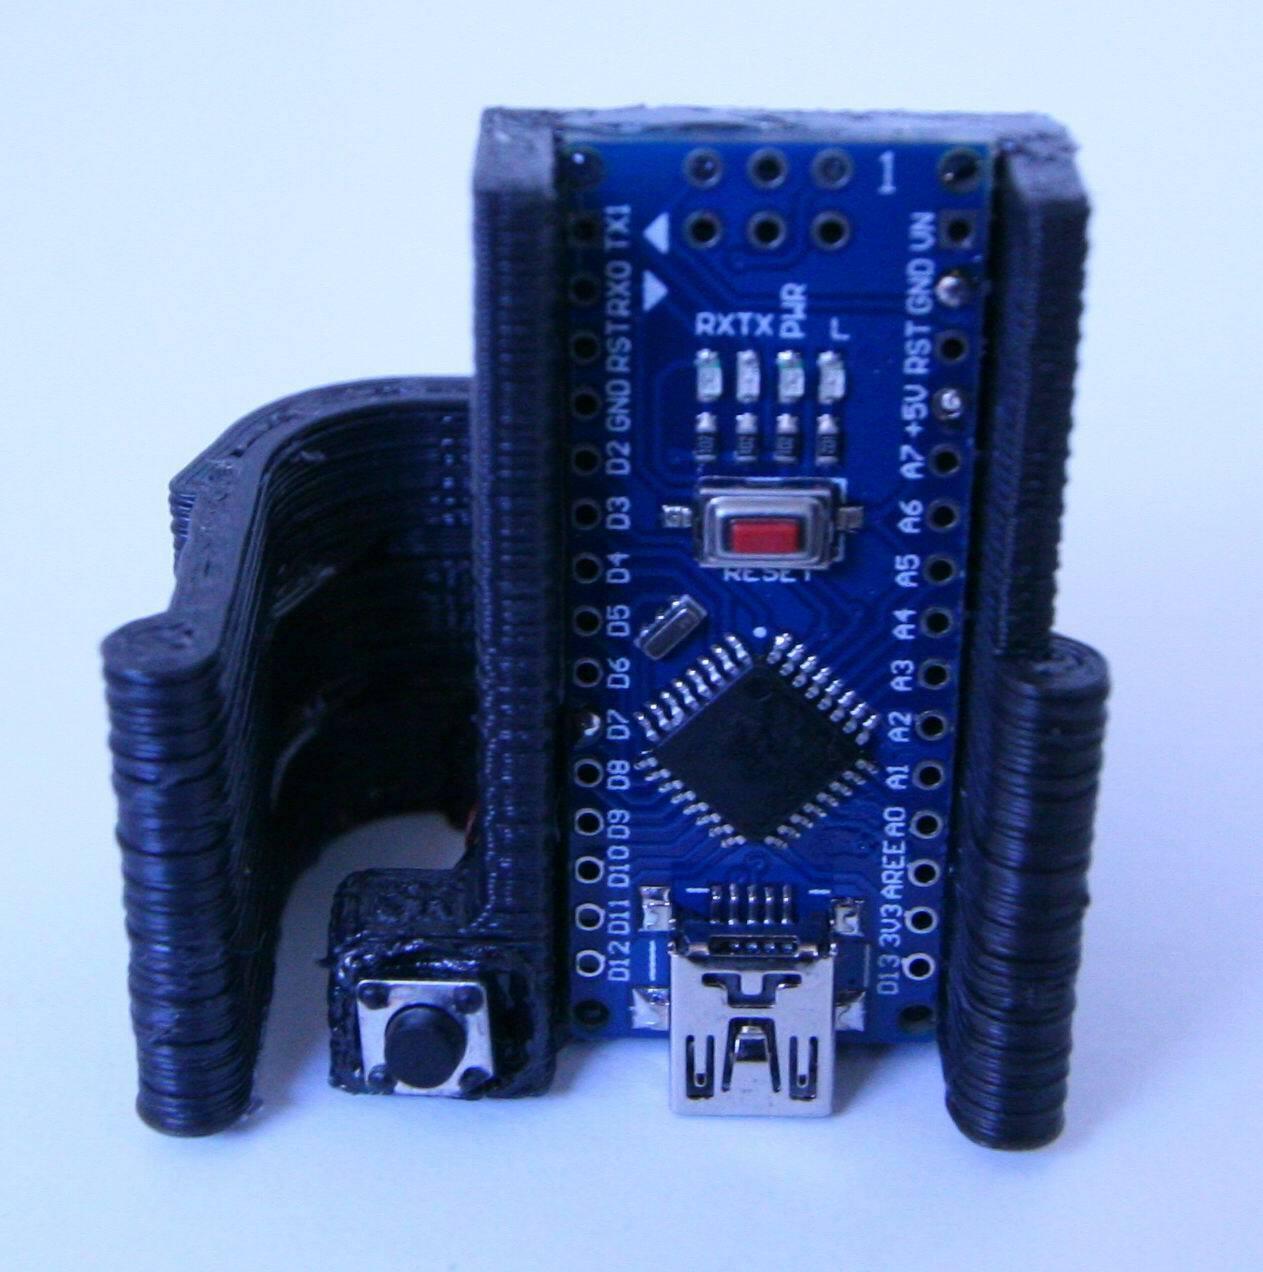 XYZ Printing da Vinci Filament Cartridge Counter Resetter - New